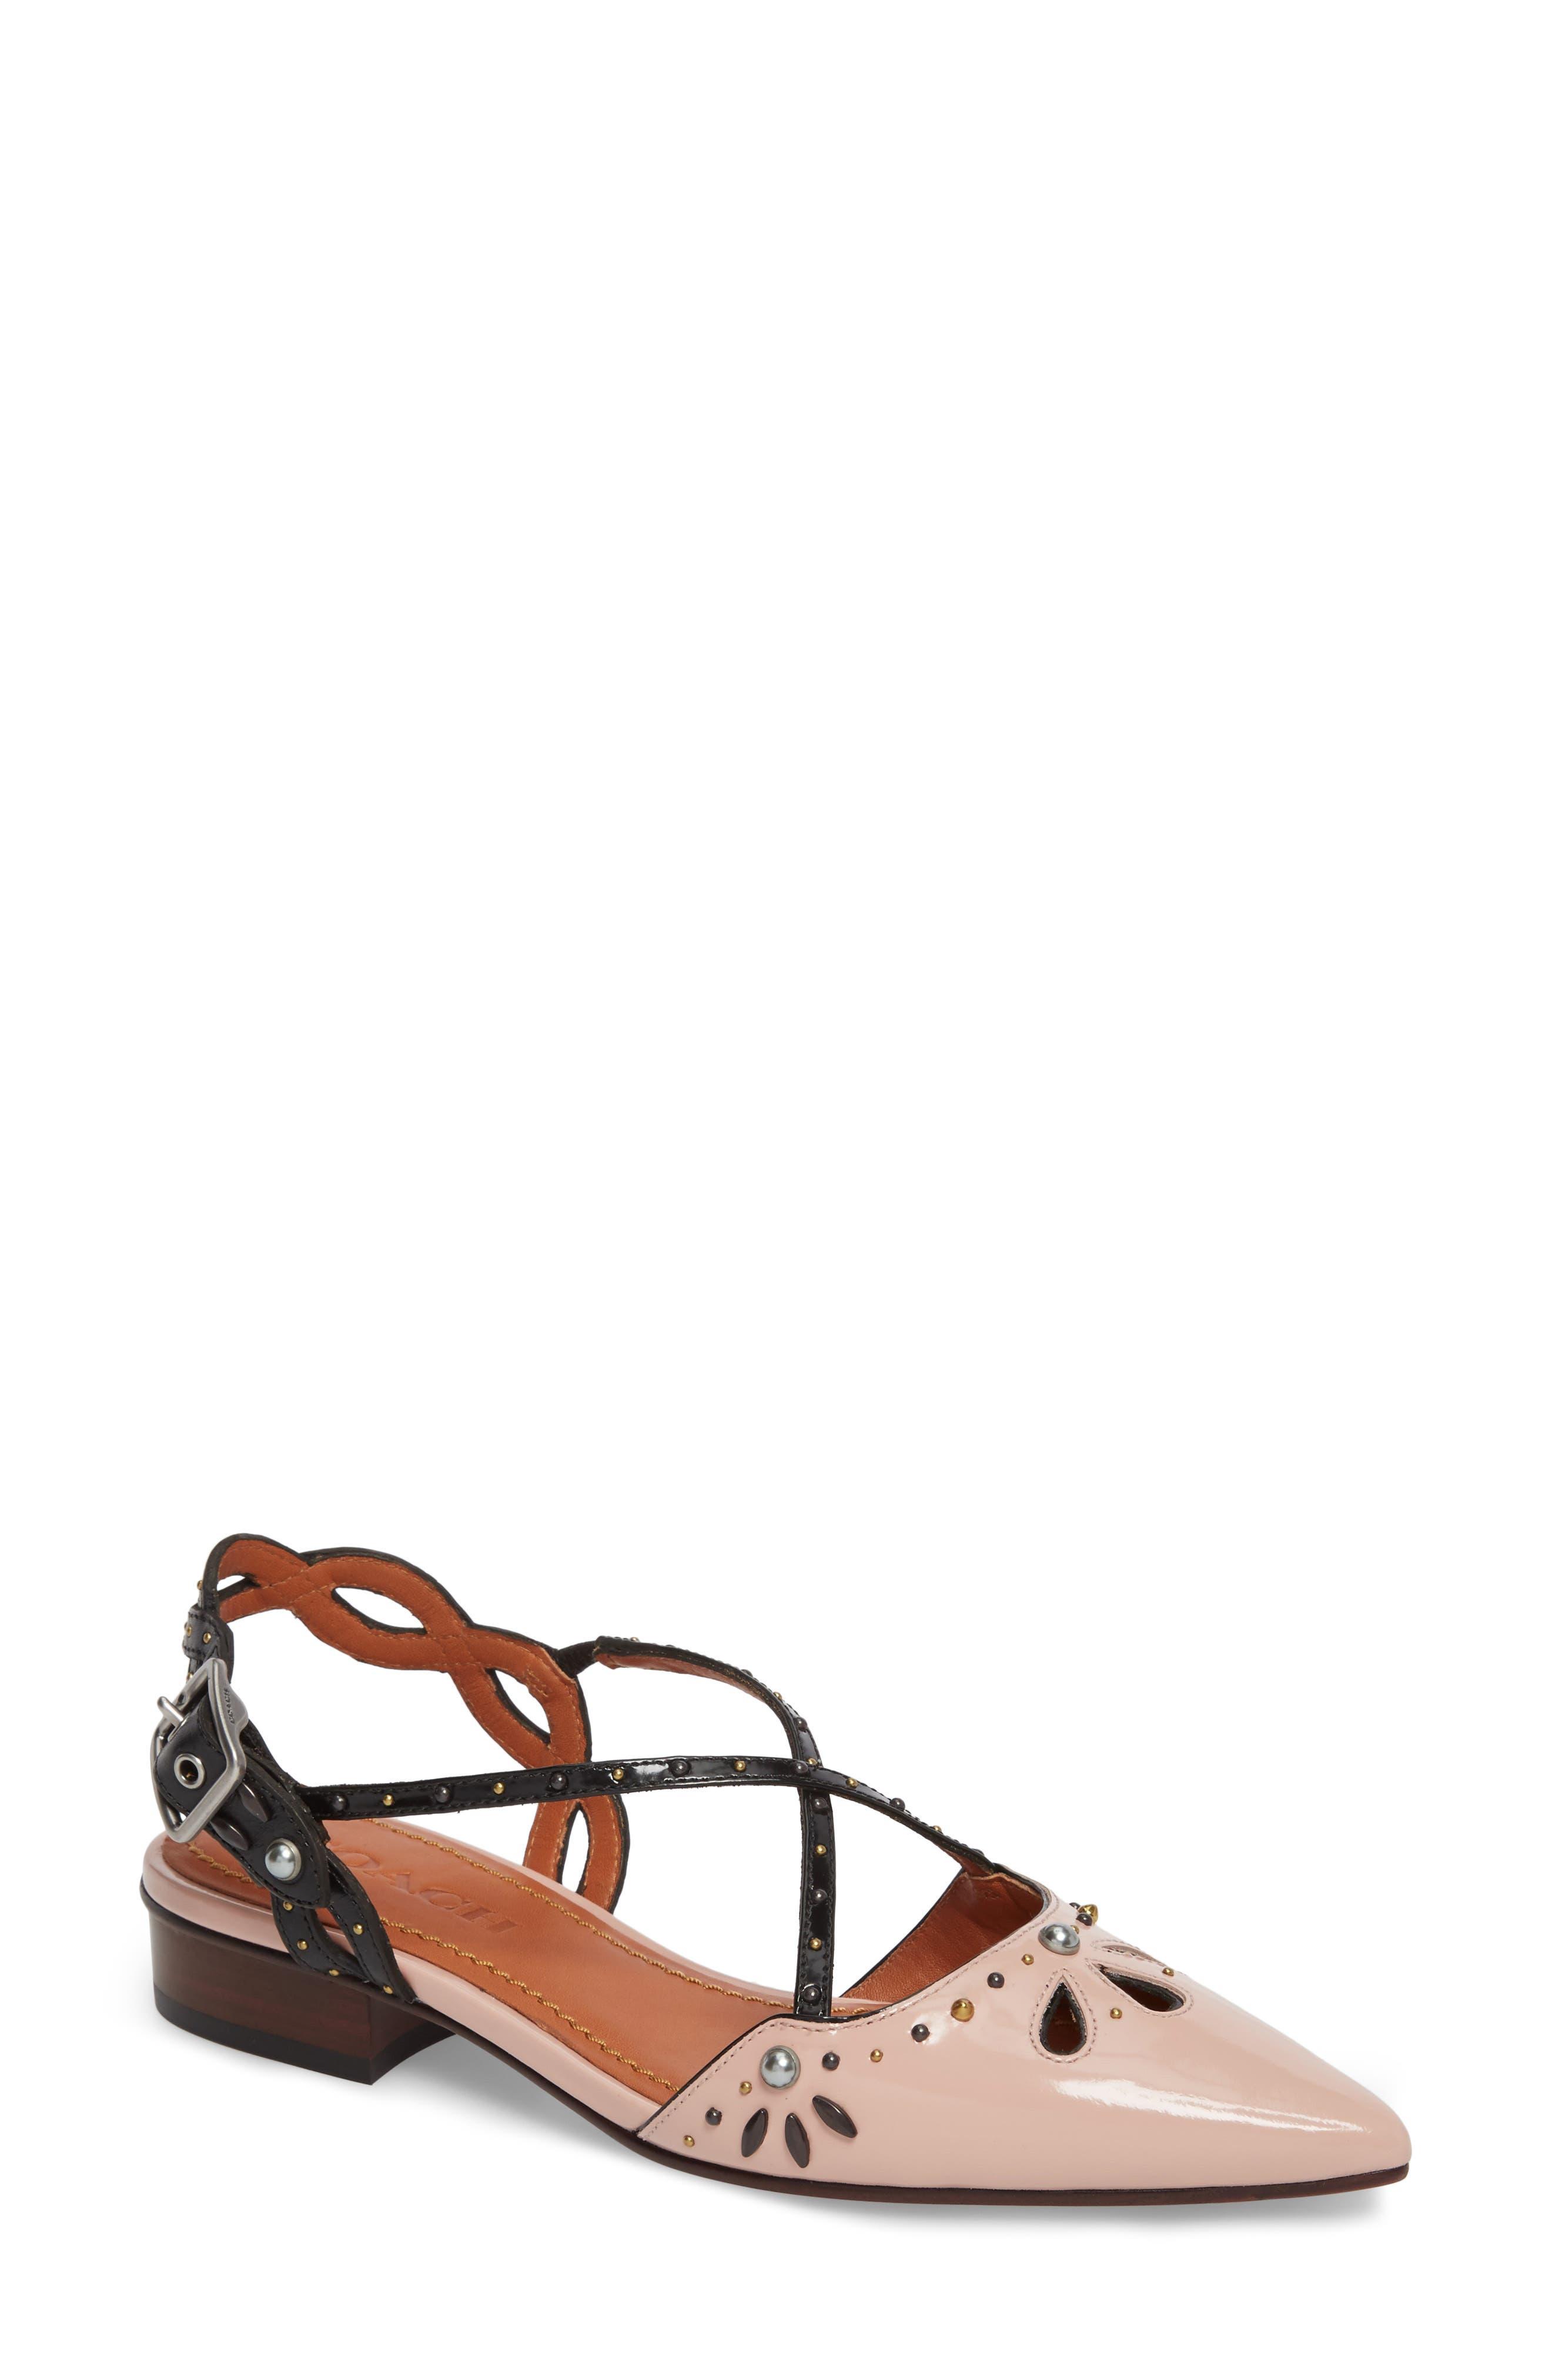 Prairie Rivet Sandal,                         Main,                         color, Pink/ Black Leather